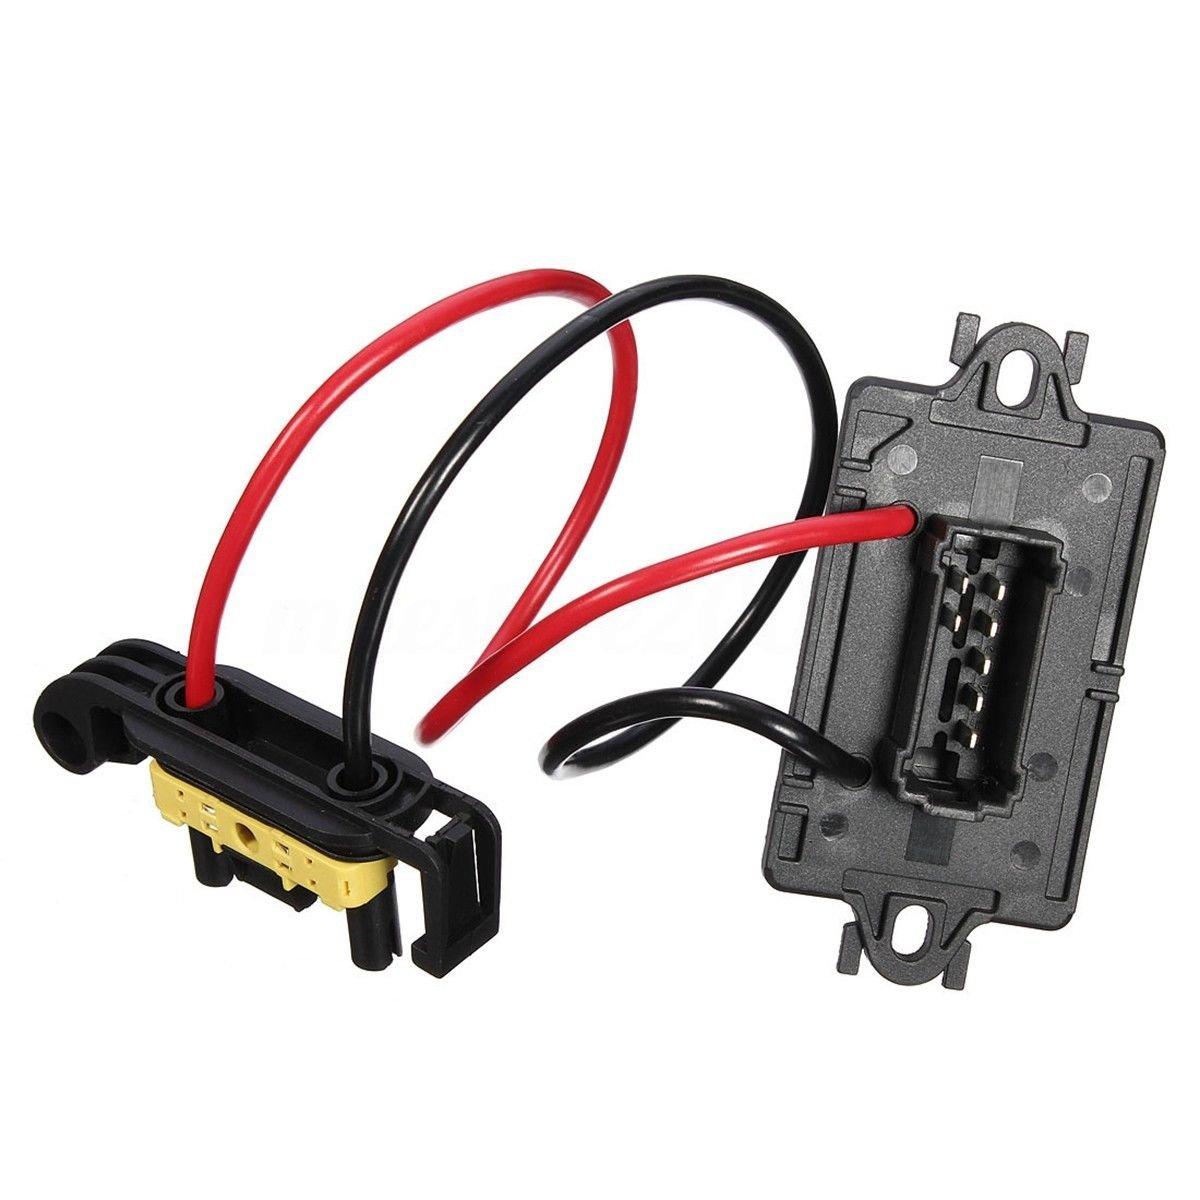 Heater Blower Motor Fan Resistor for Renault Megane MK2 II 7701207717 Brand New